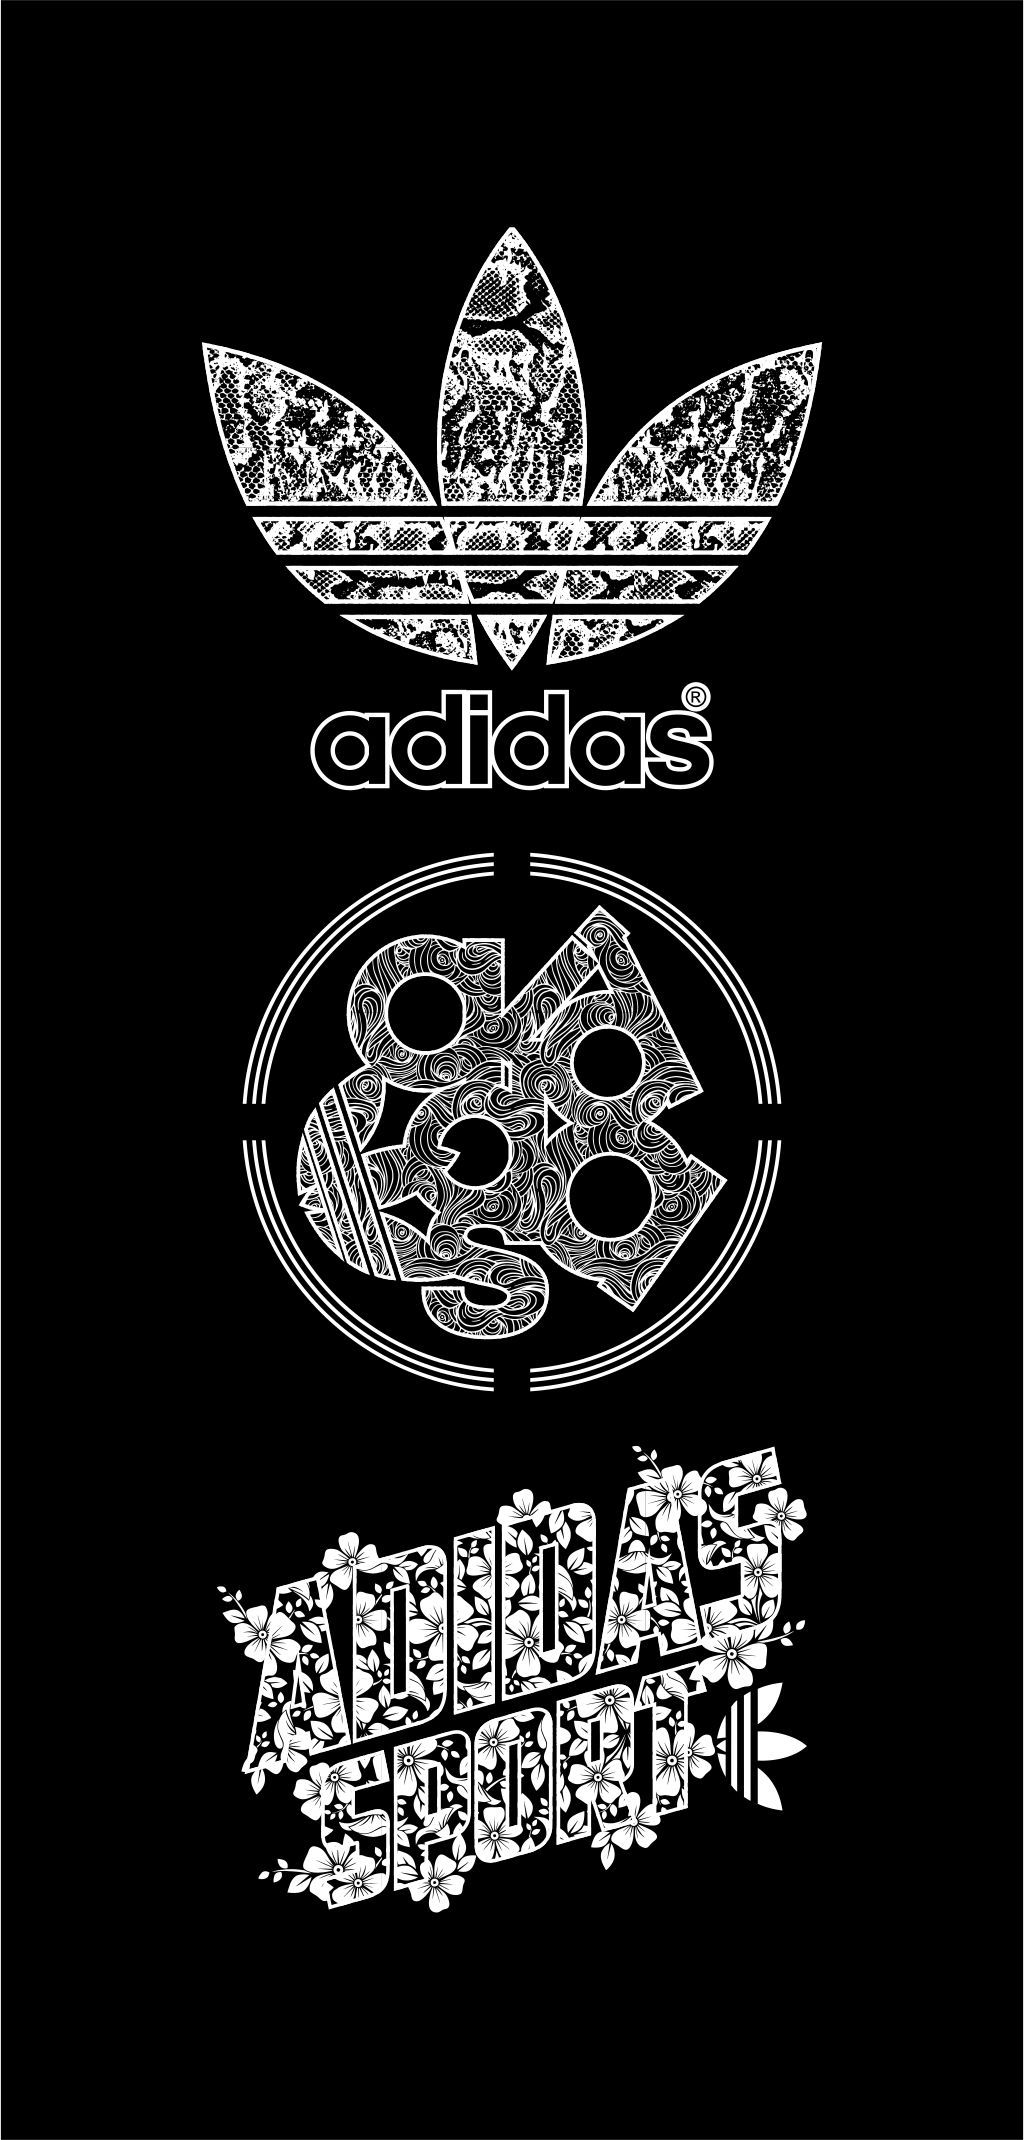 Mejor whisky Establecimiento  Adidas Logo | Adidas logo wallpapers, Adidas art, Black panther art